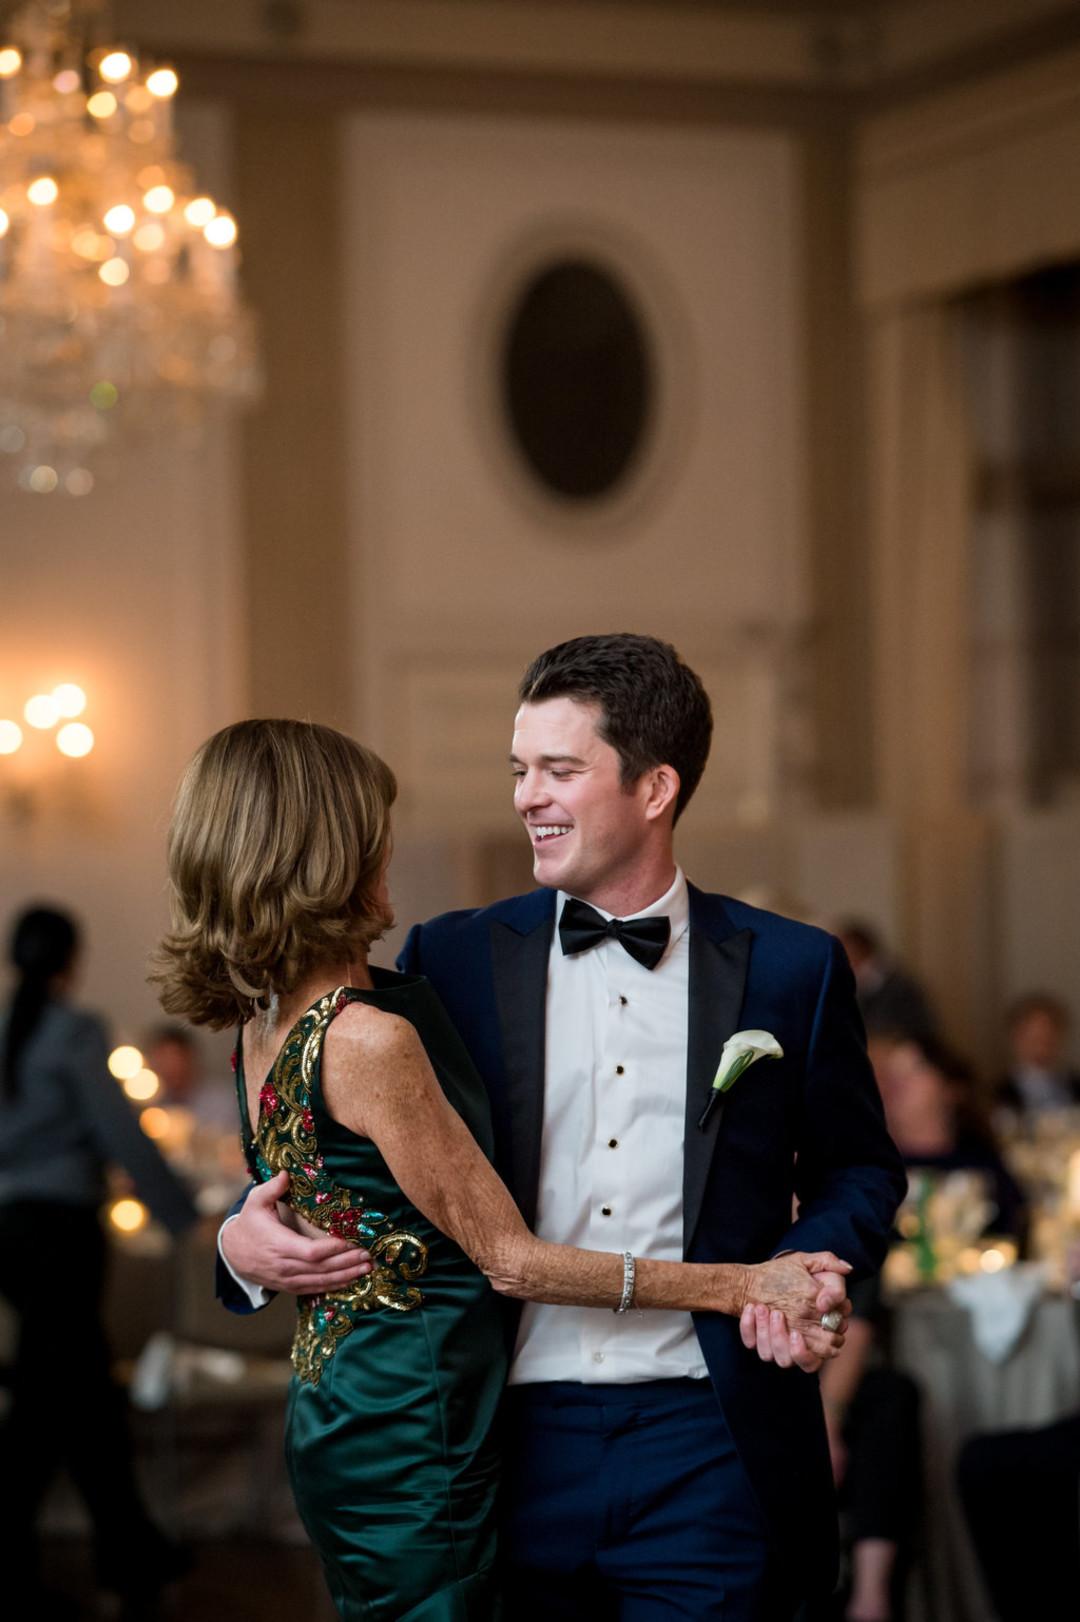 Mother Son Dance The Standard Room Chicago Wedding Julia Franzosa Photography